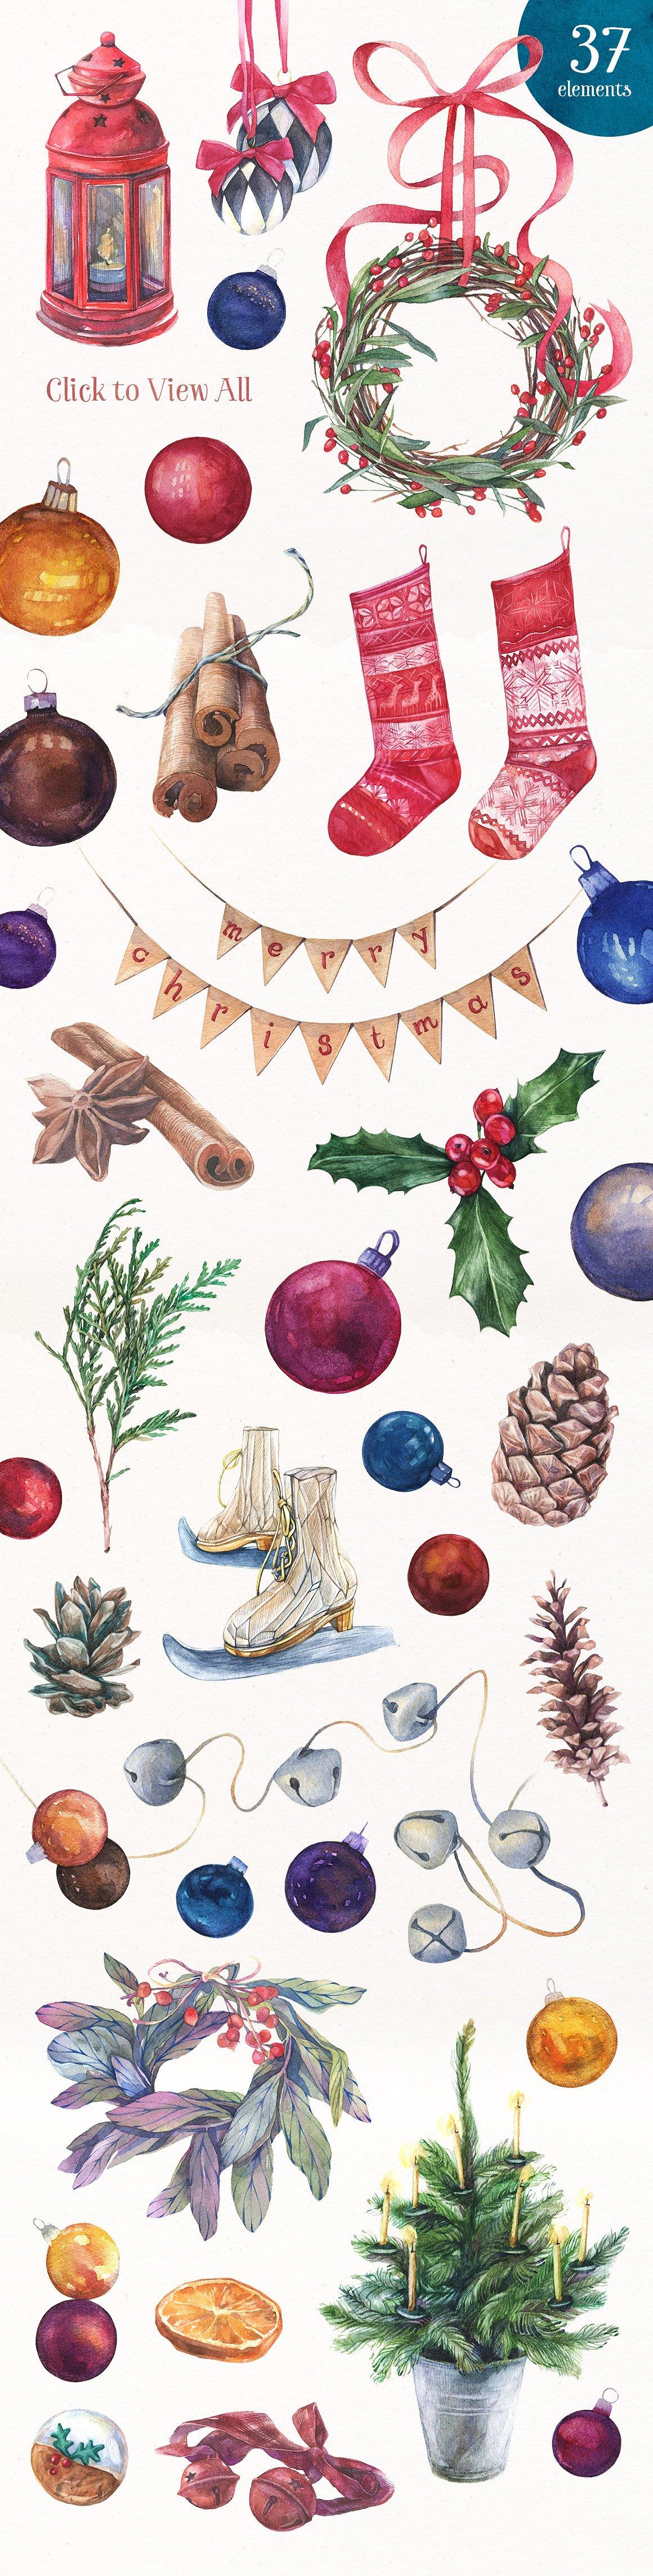 Licorice Christmas Watercolor Kit2